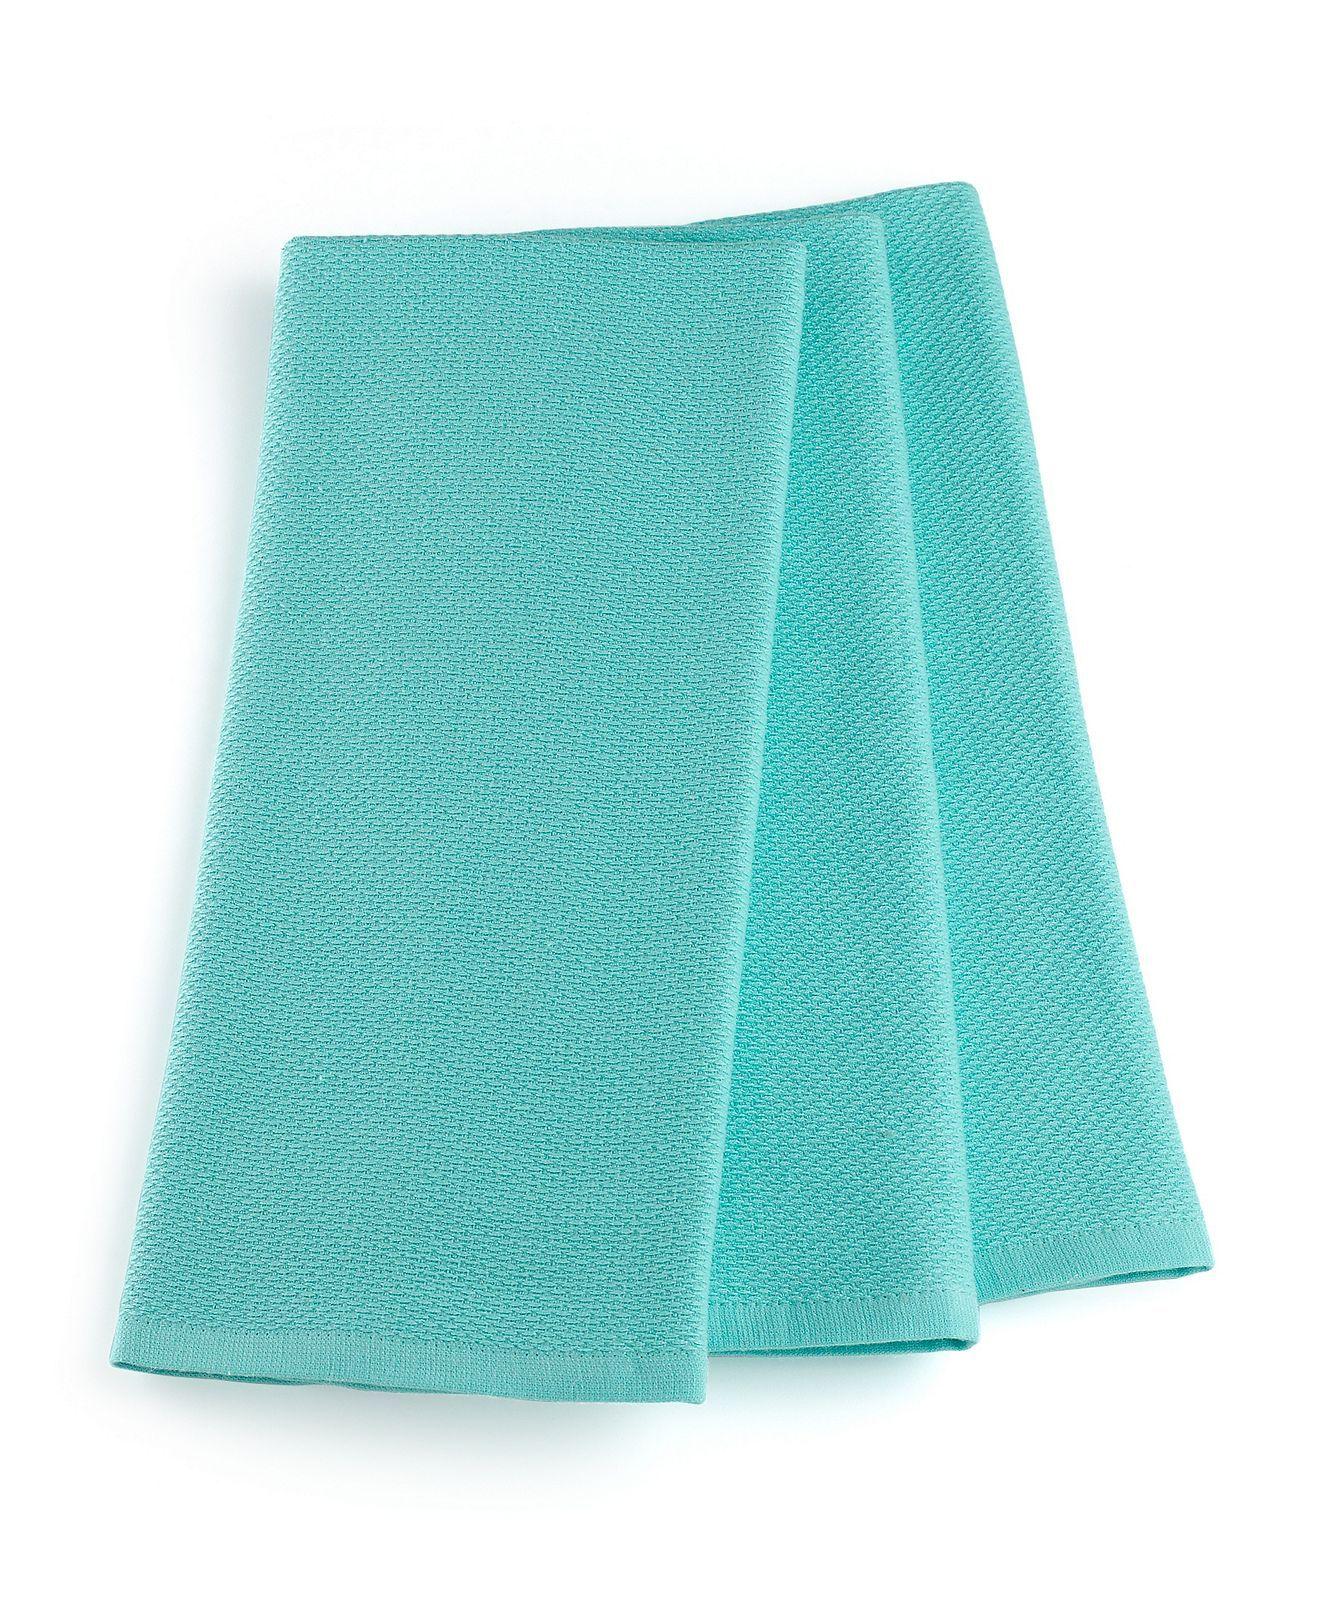 martha stewart kitchen towels faucets repair 16 99 collection pique set